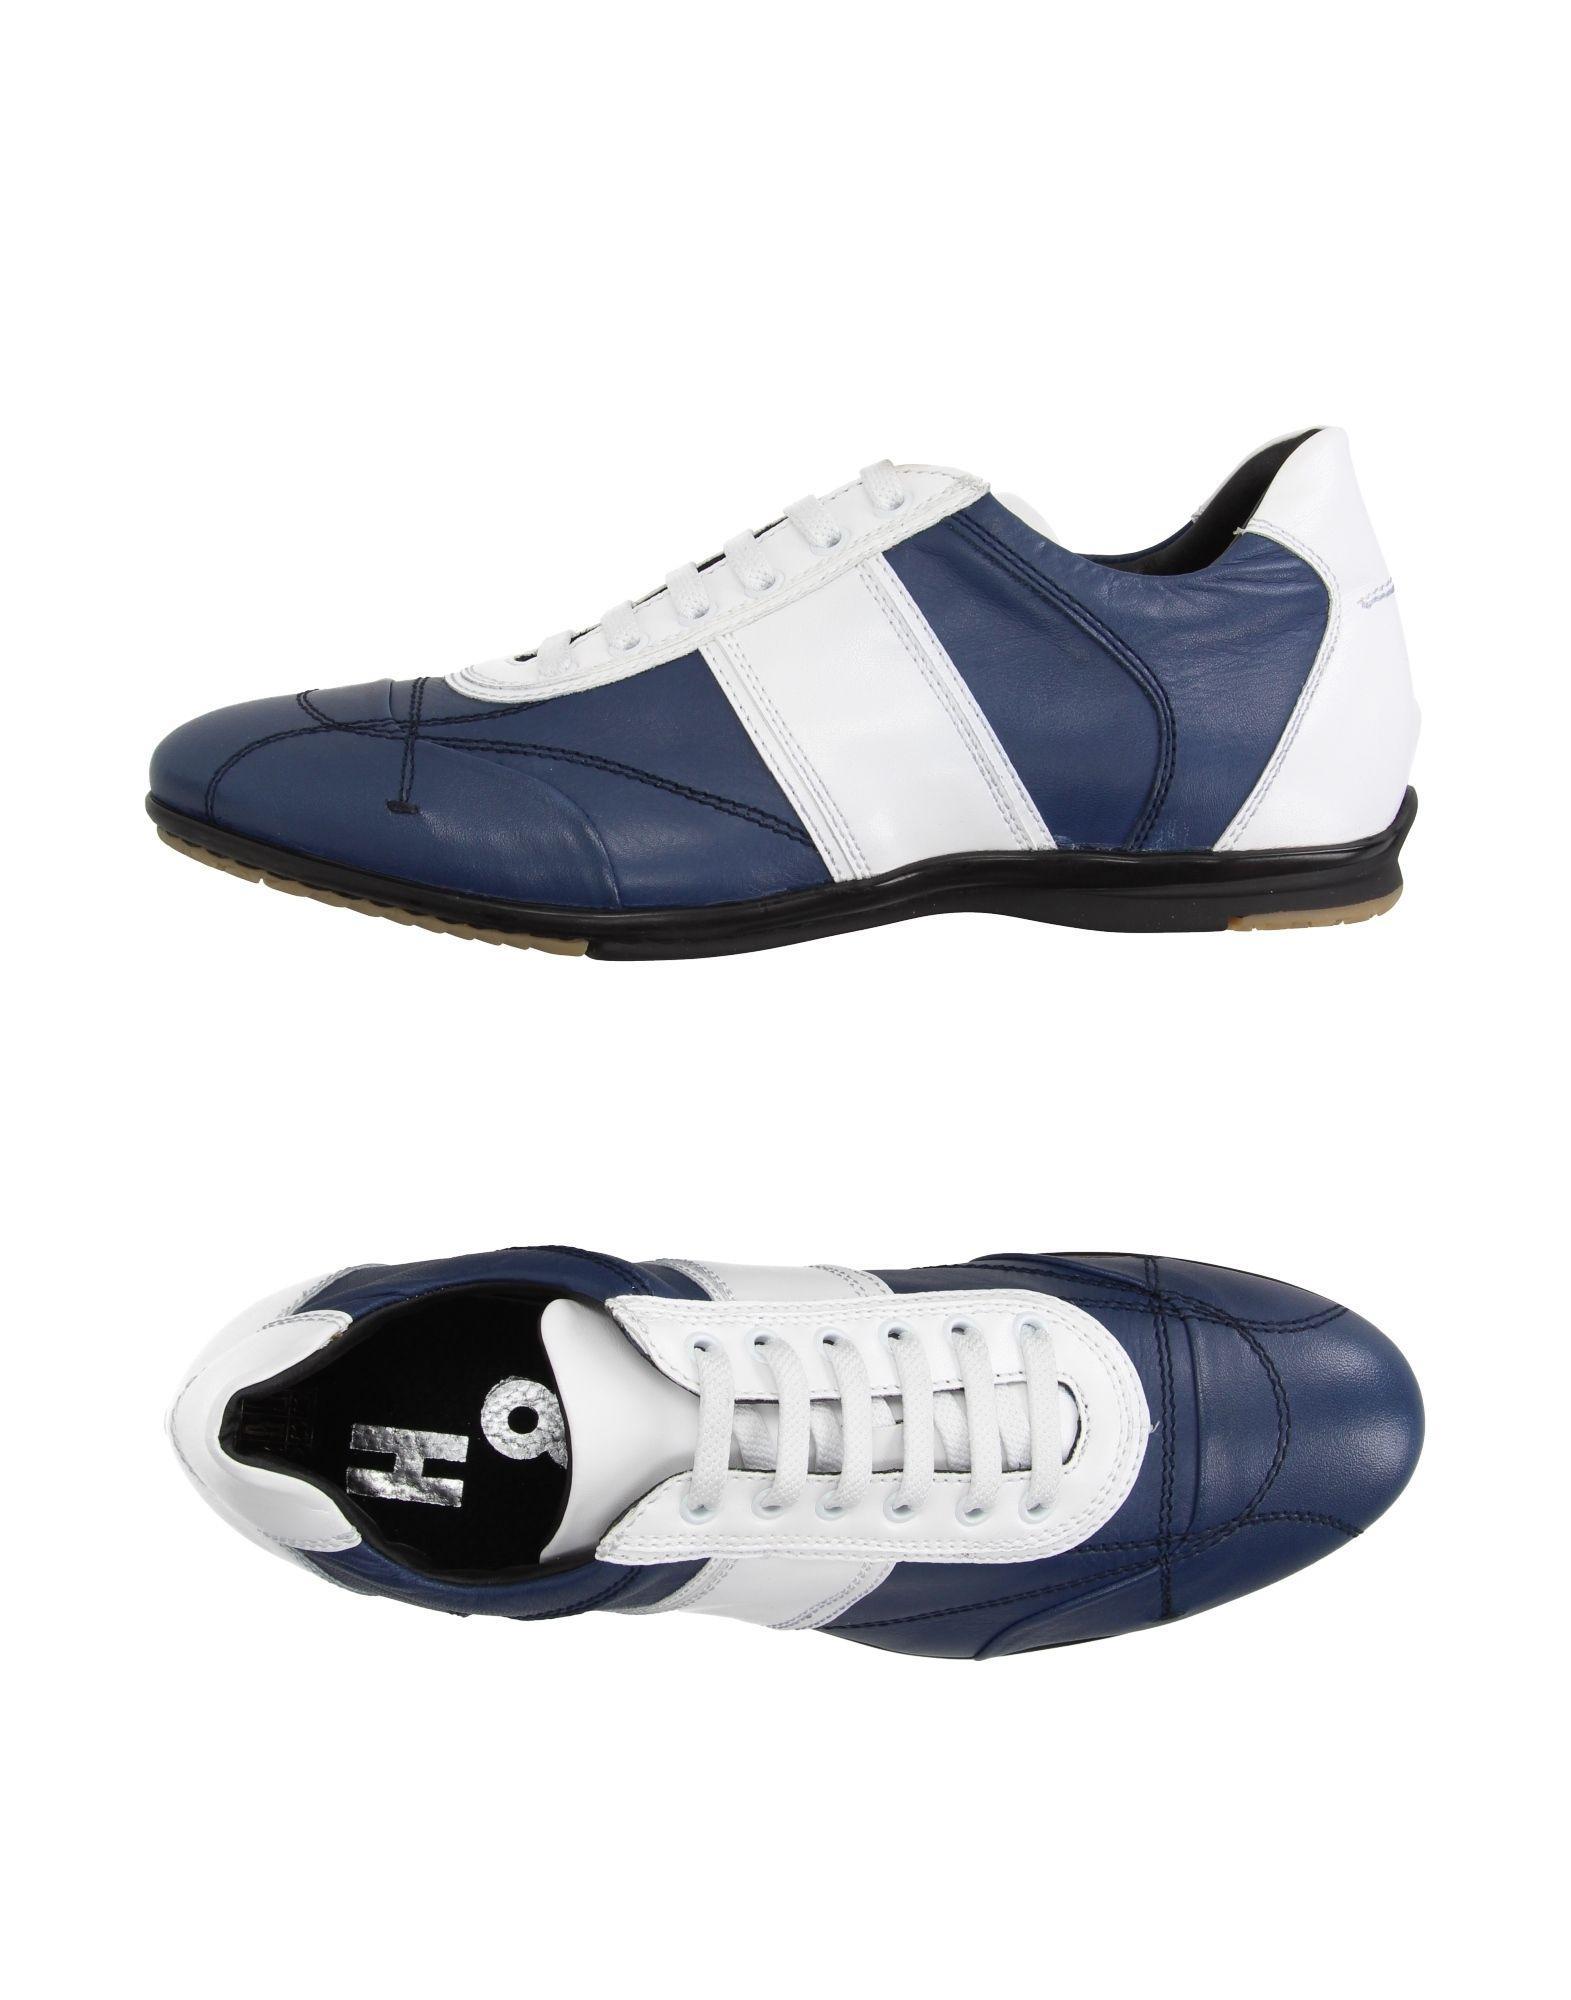 on sale a1cb7 801bb Sneakers in Dark Blue